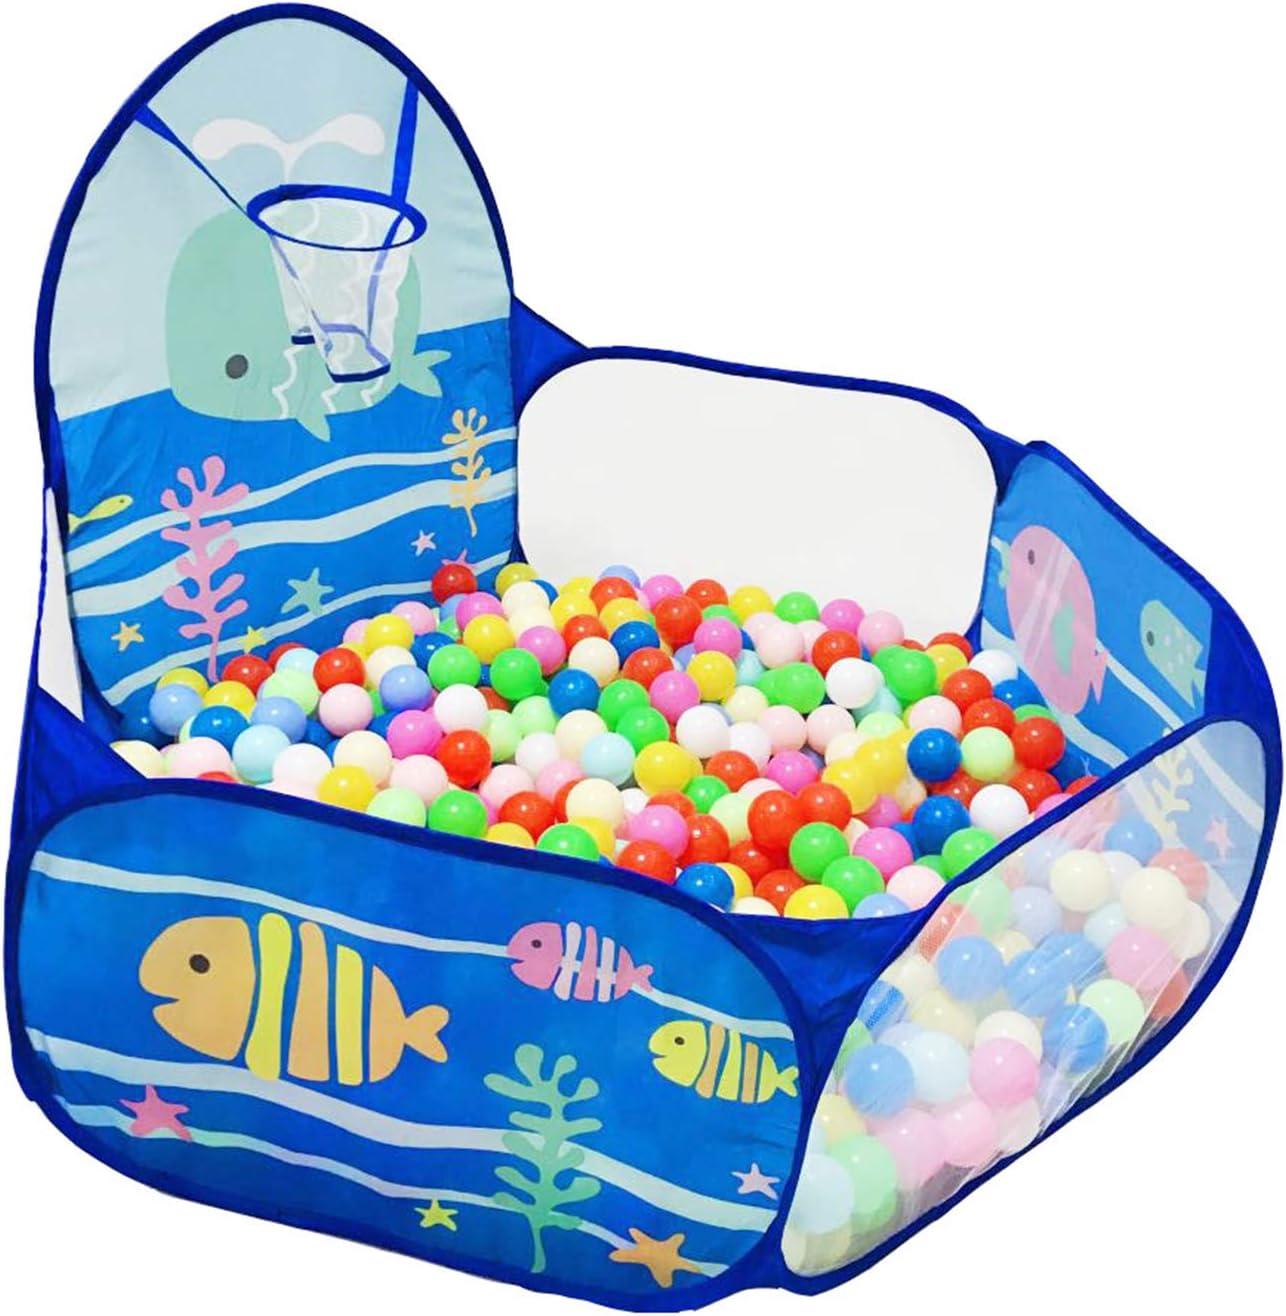 LOJETON Kids Ball cheap Pit Pop Up Oc Play Children Tent Toddler Ranking TOP9